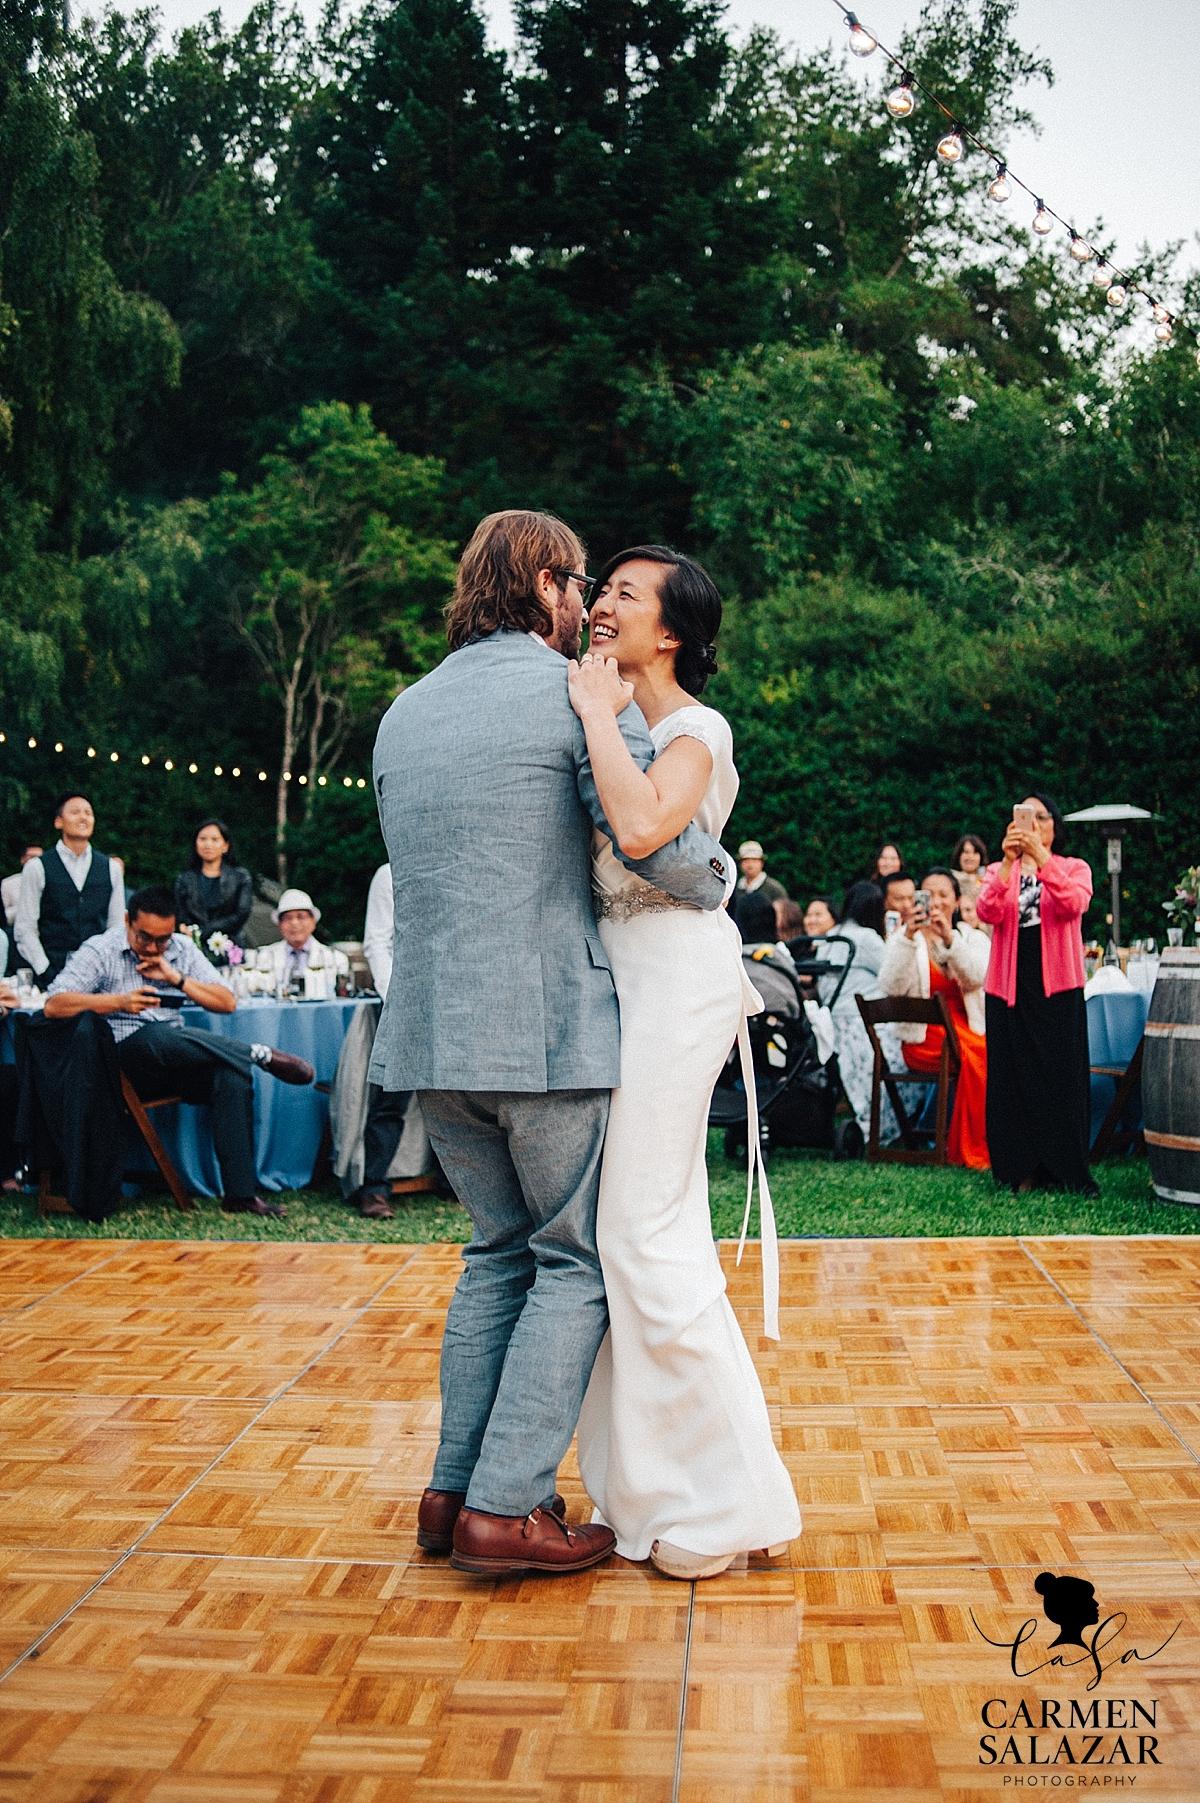 Happy Bay Area bride during first dance - Carmen Salazar